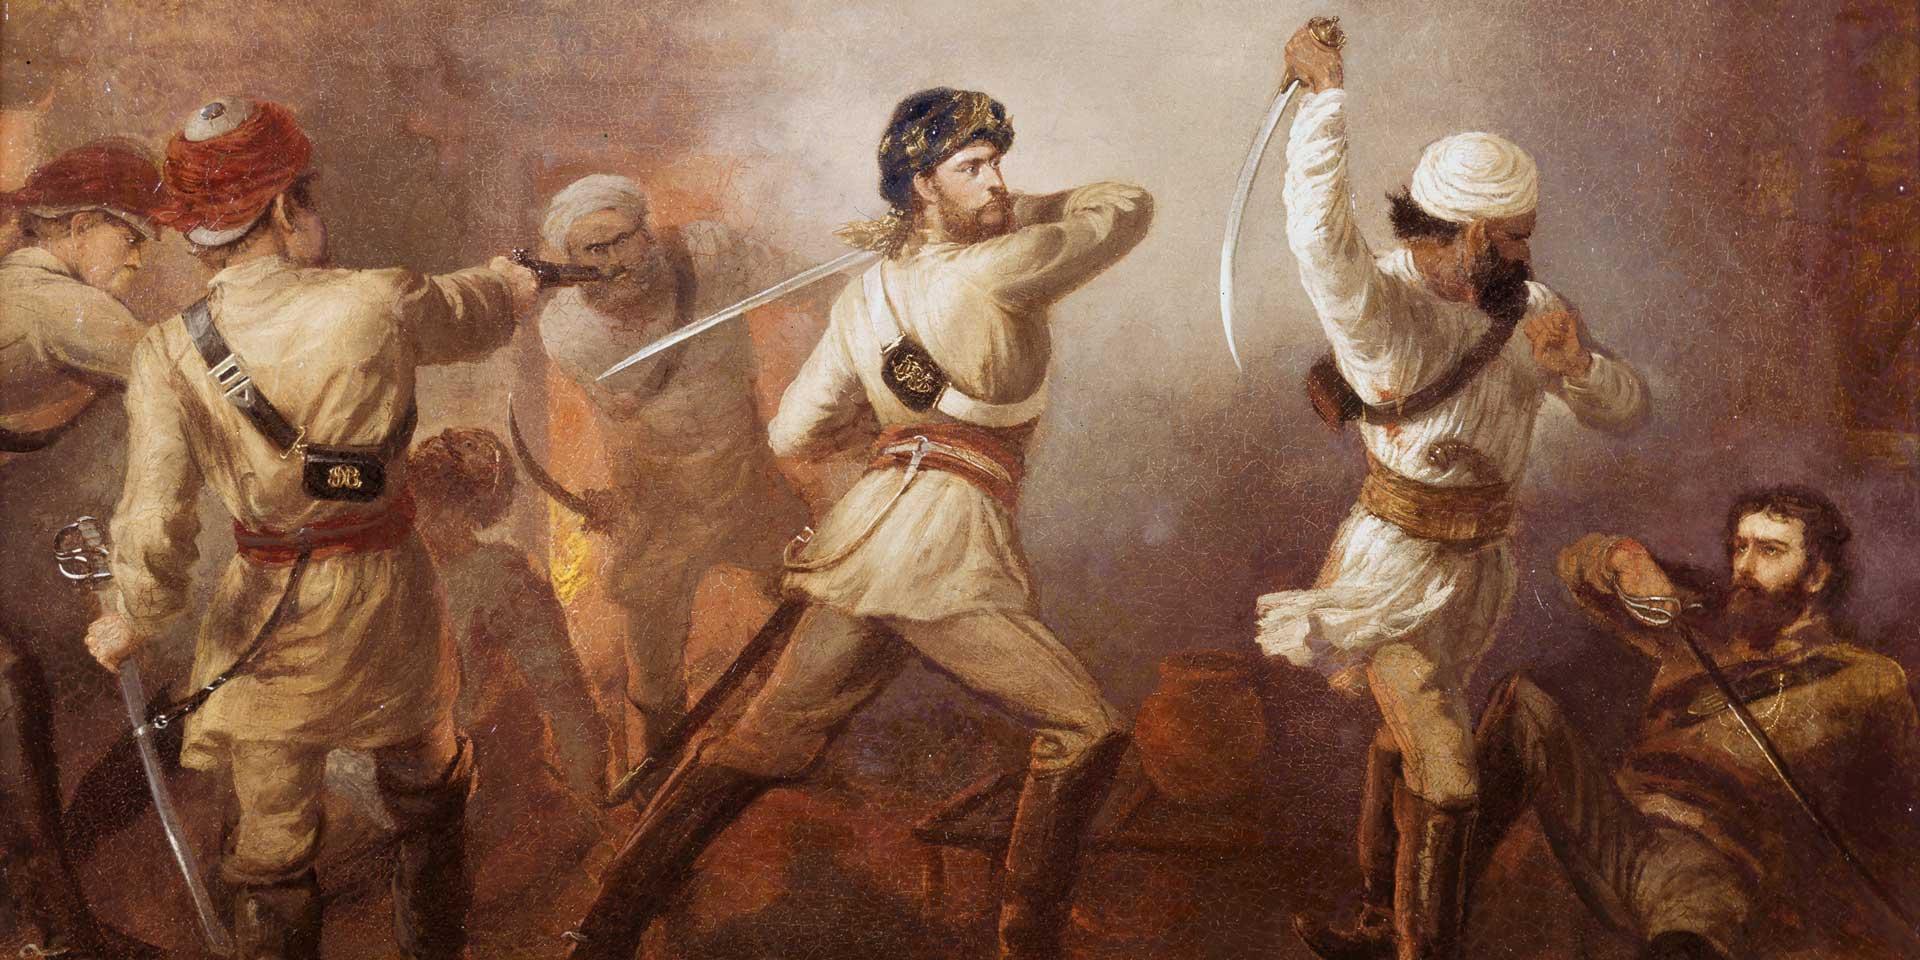 Captain Charles Gough, 5th (Bengal) European Cavalry, winning the VC, 15 August 1857